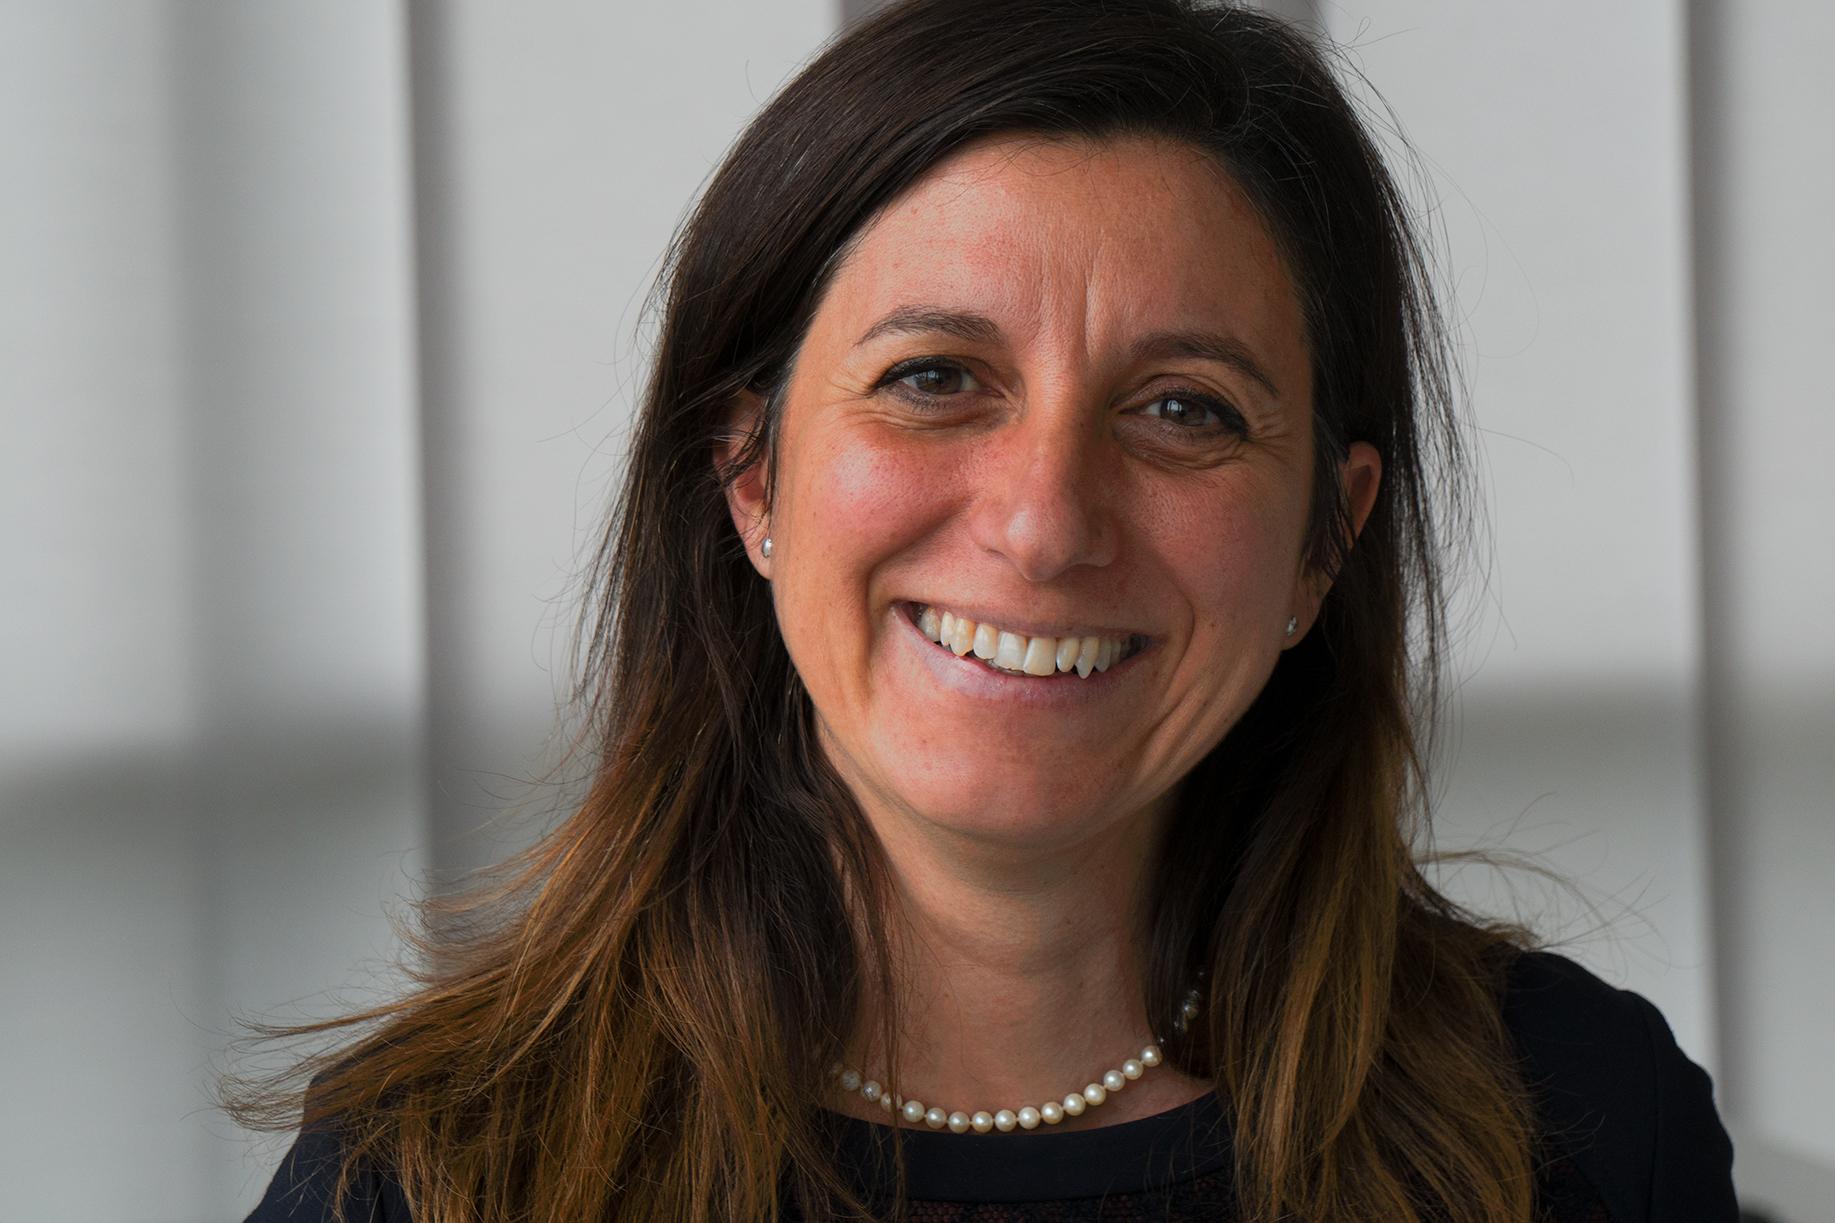 Francesca Pascali